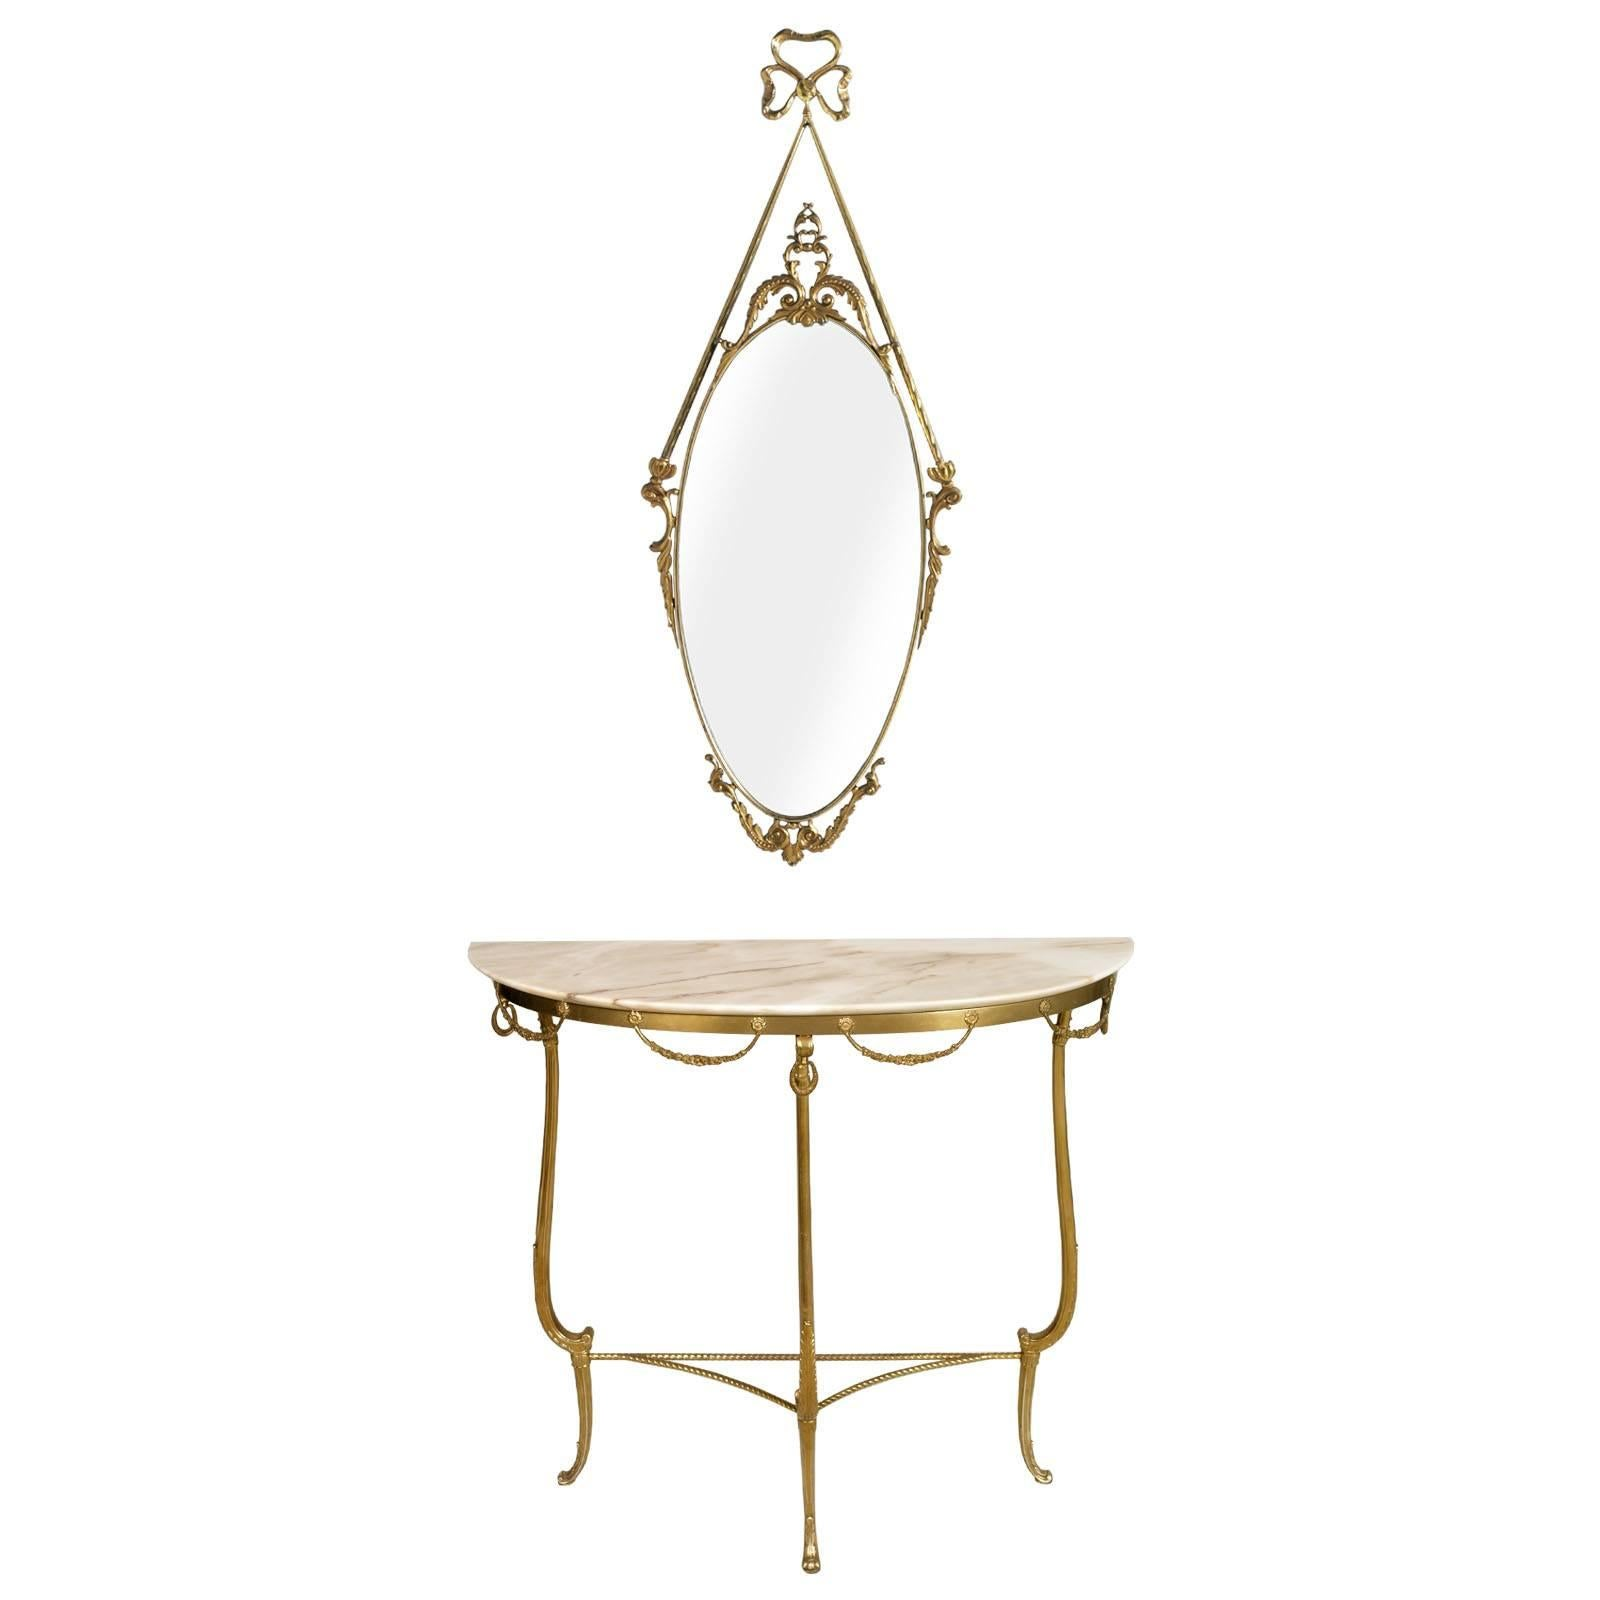 Gilt Bronze Venetian Console & Mirror, Marble Top, Vincenzo Cadorin Attributed